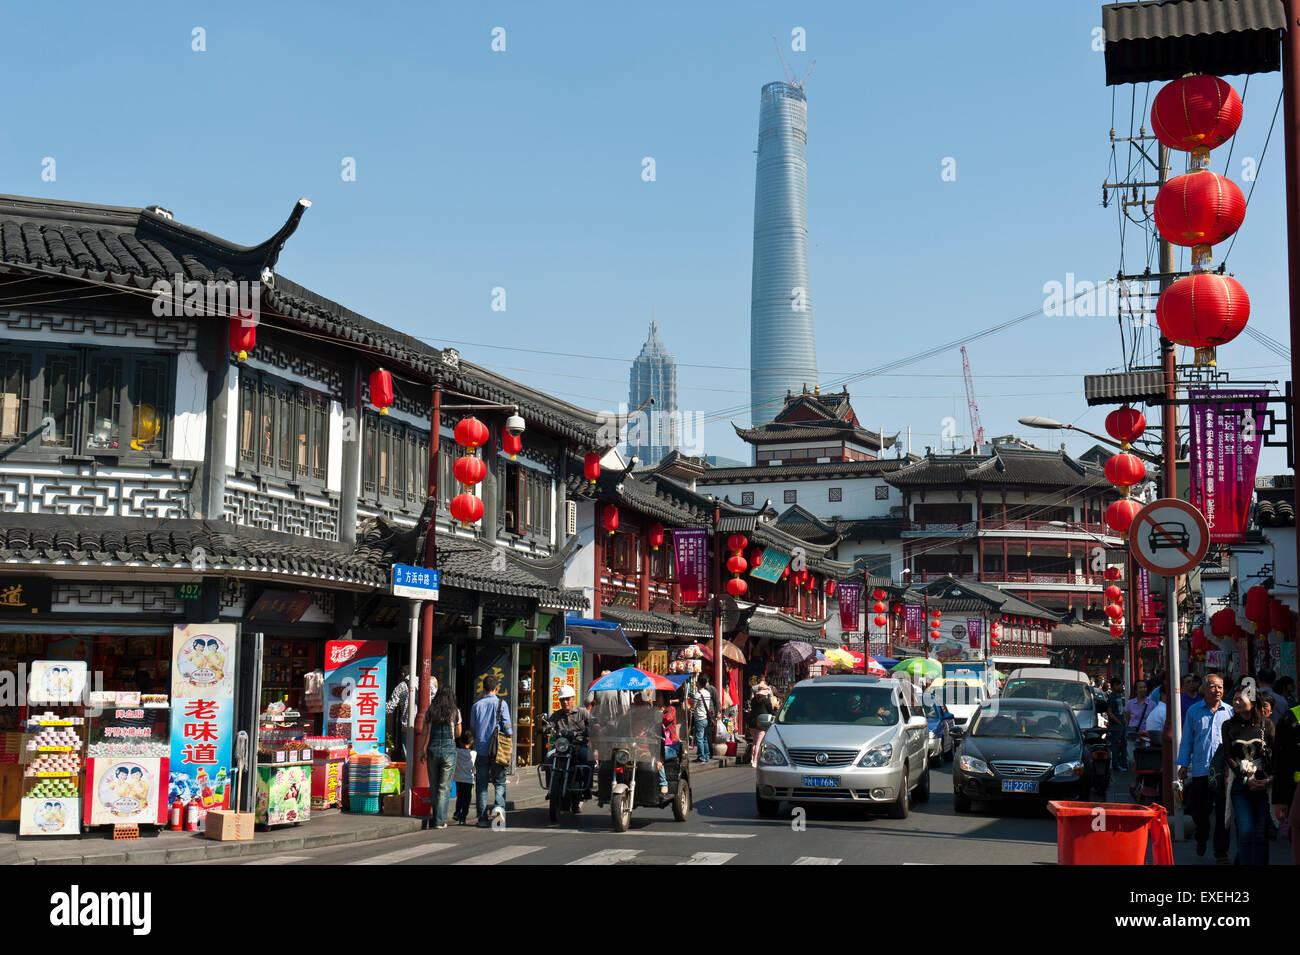 Shopping street, lanterne rosse, case in stile antico, città vecchia bazaar, Nanshi, Torre di Jin Mao e Shanghai Immagini Stock